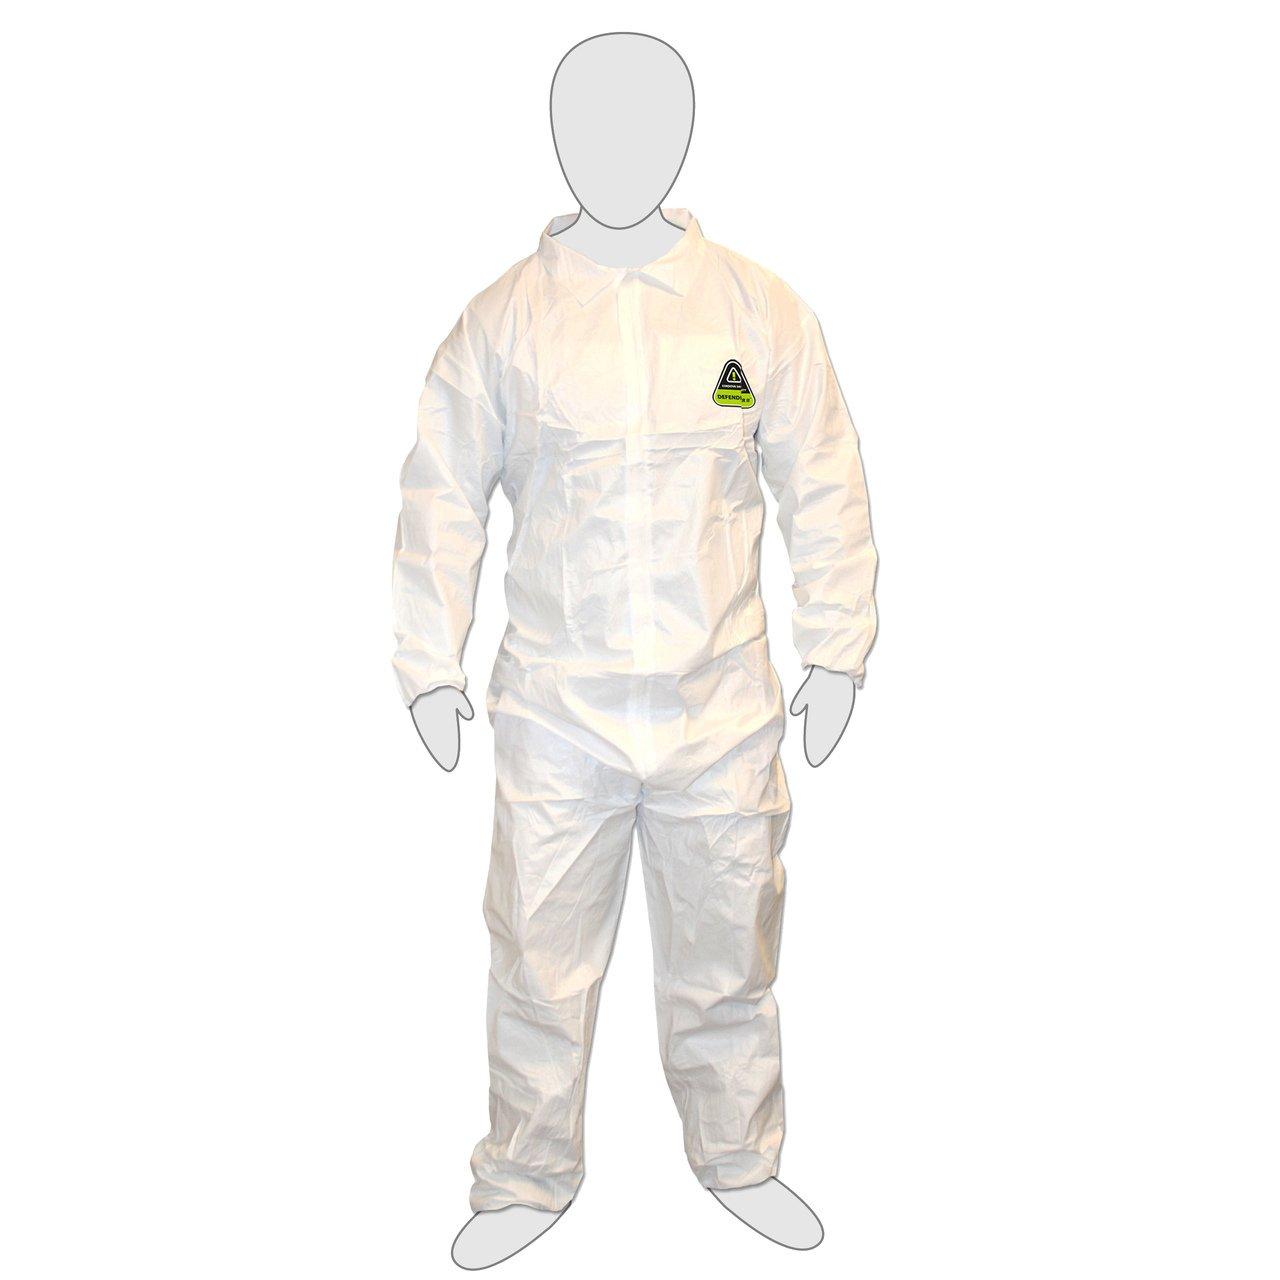 Cordova CPE3XL - DEFENDER White Coverall, Zipper Front -3X-Large (Case of 25)